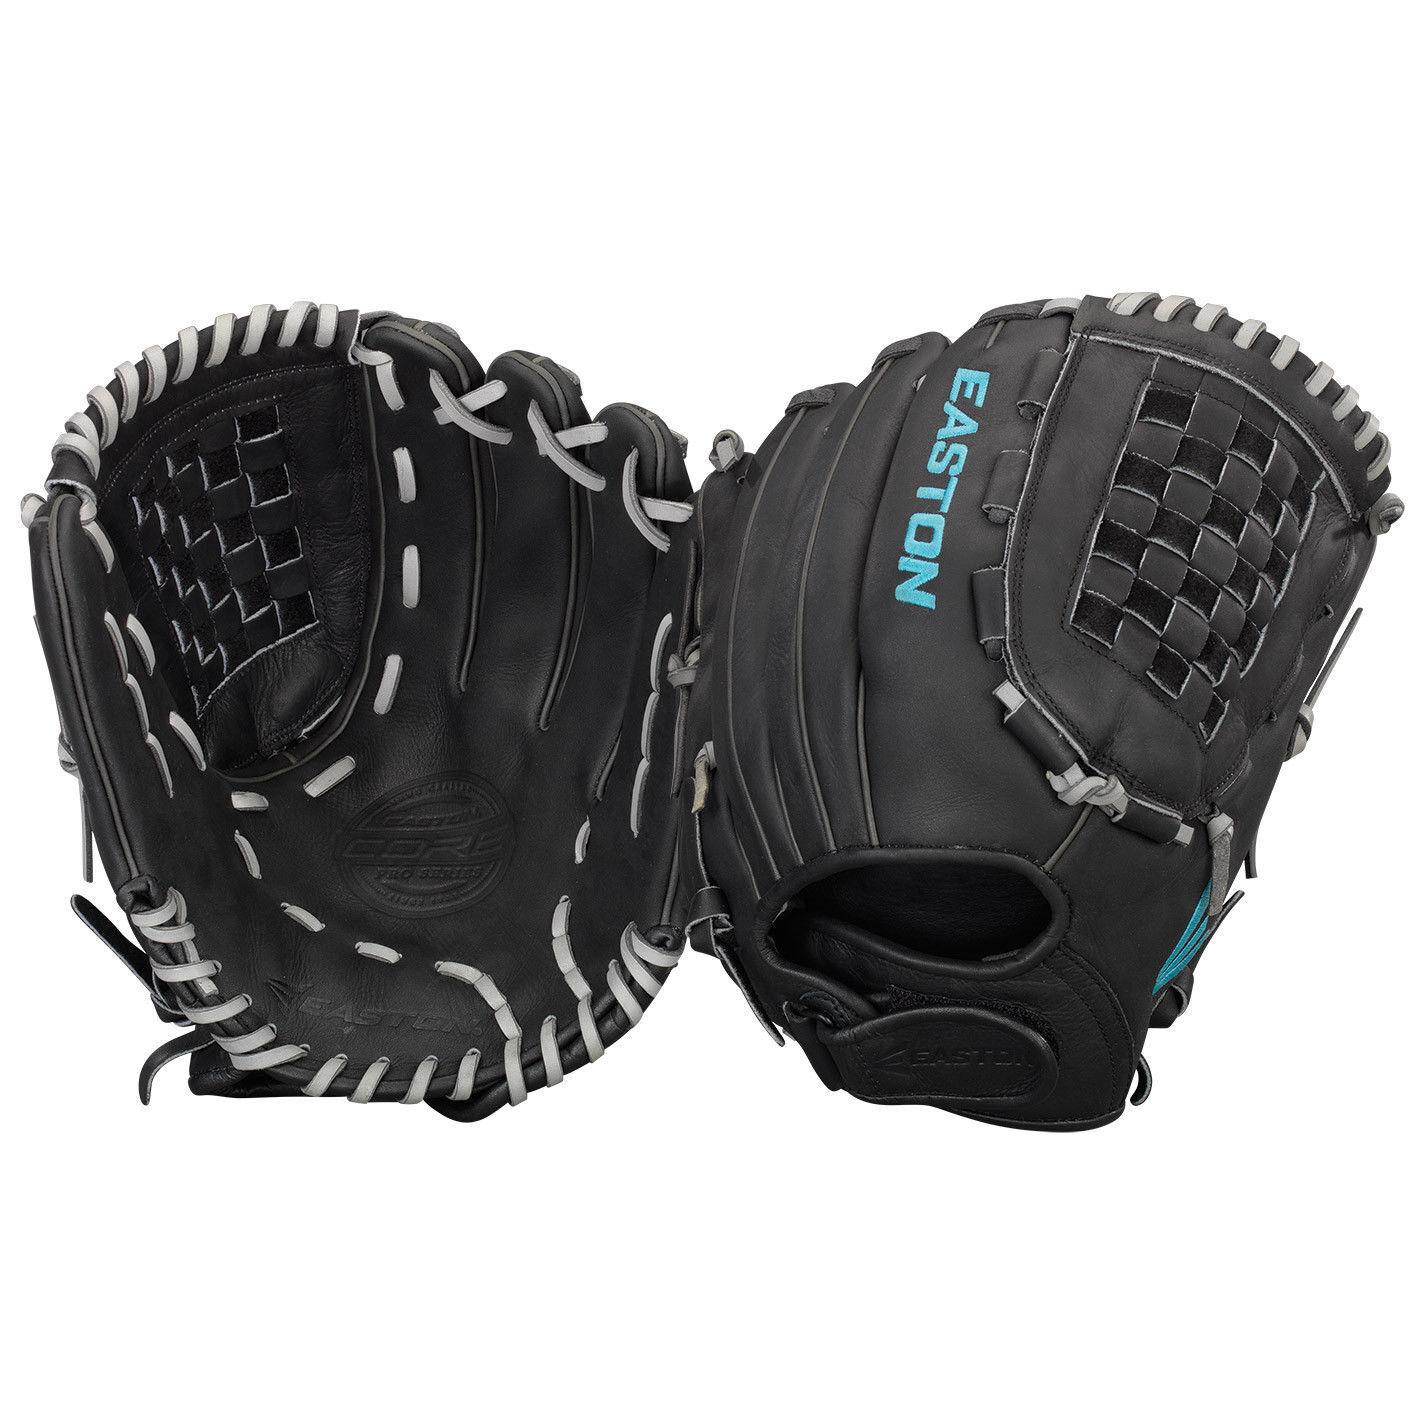 Easton Core Pro 12.5  Fastpitch Softball guante izquierdo tirar corefp 1250 BKGY LHT Nuevo